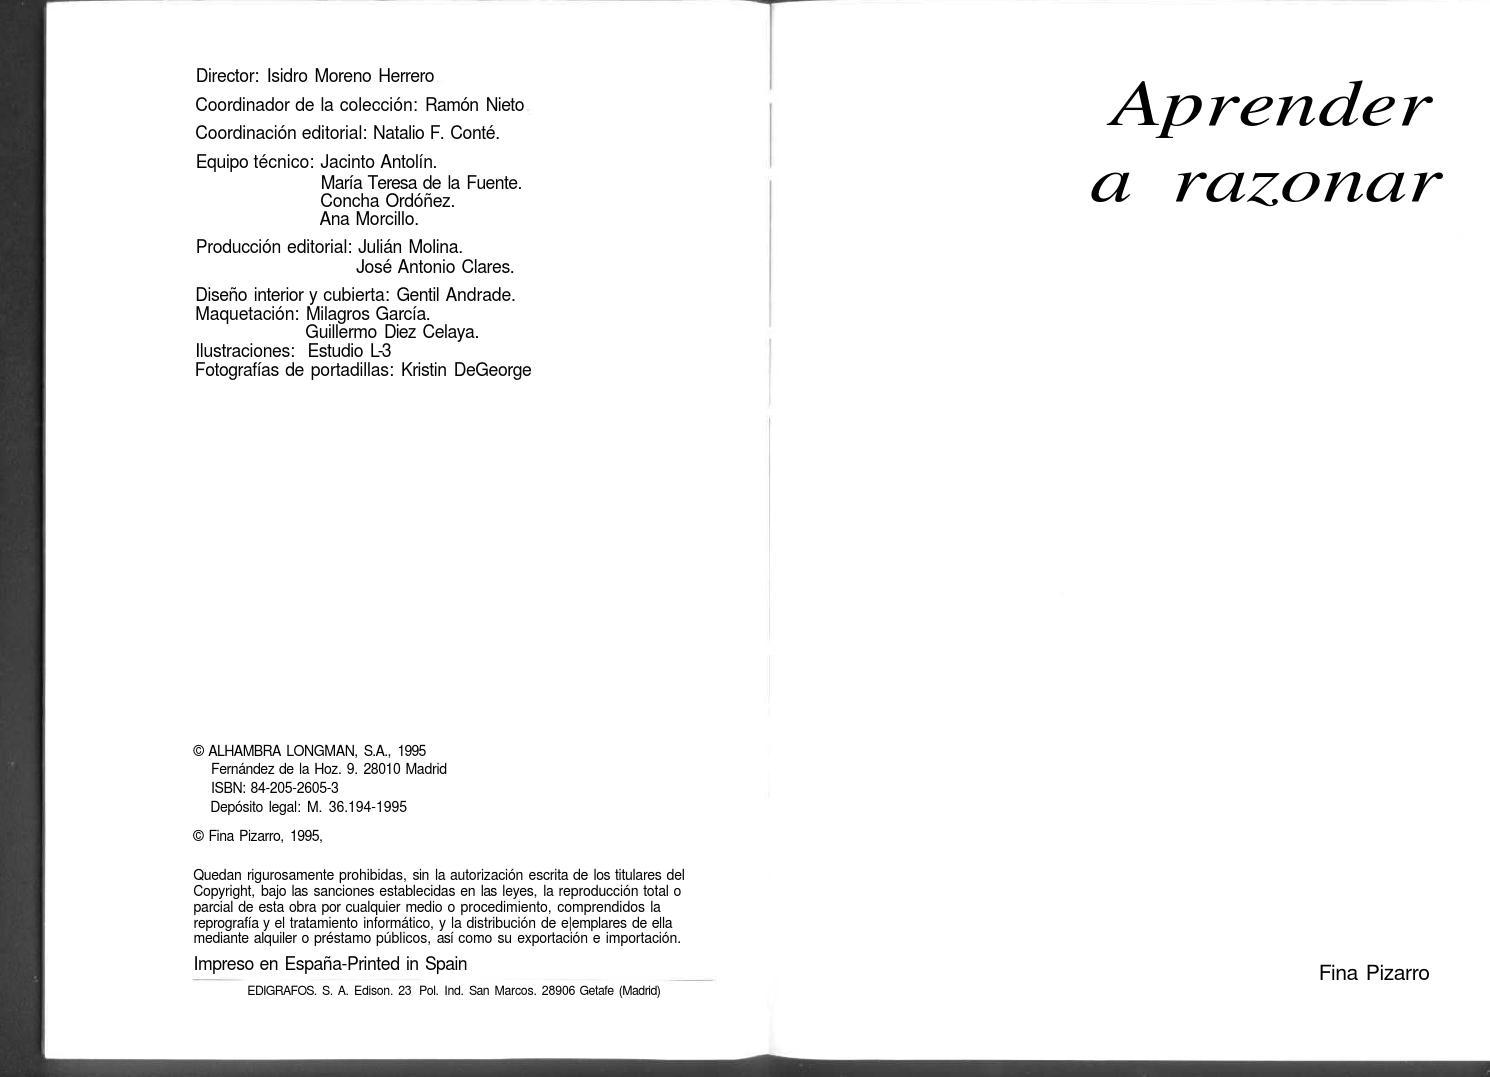 Aprender a razonar fina pizarro by Luis David Paz - issuu